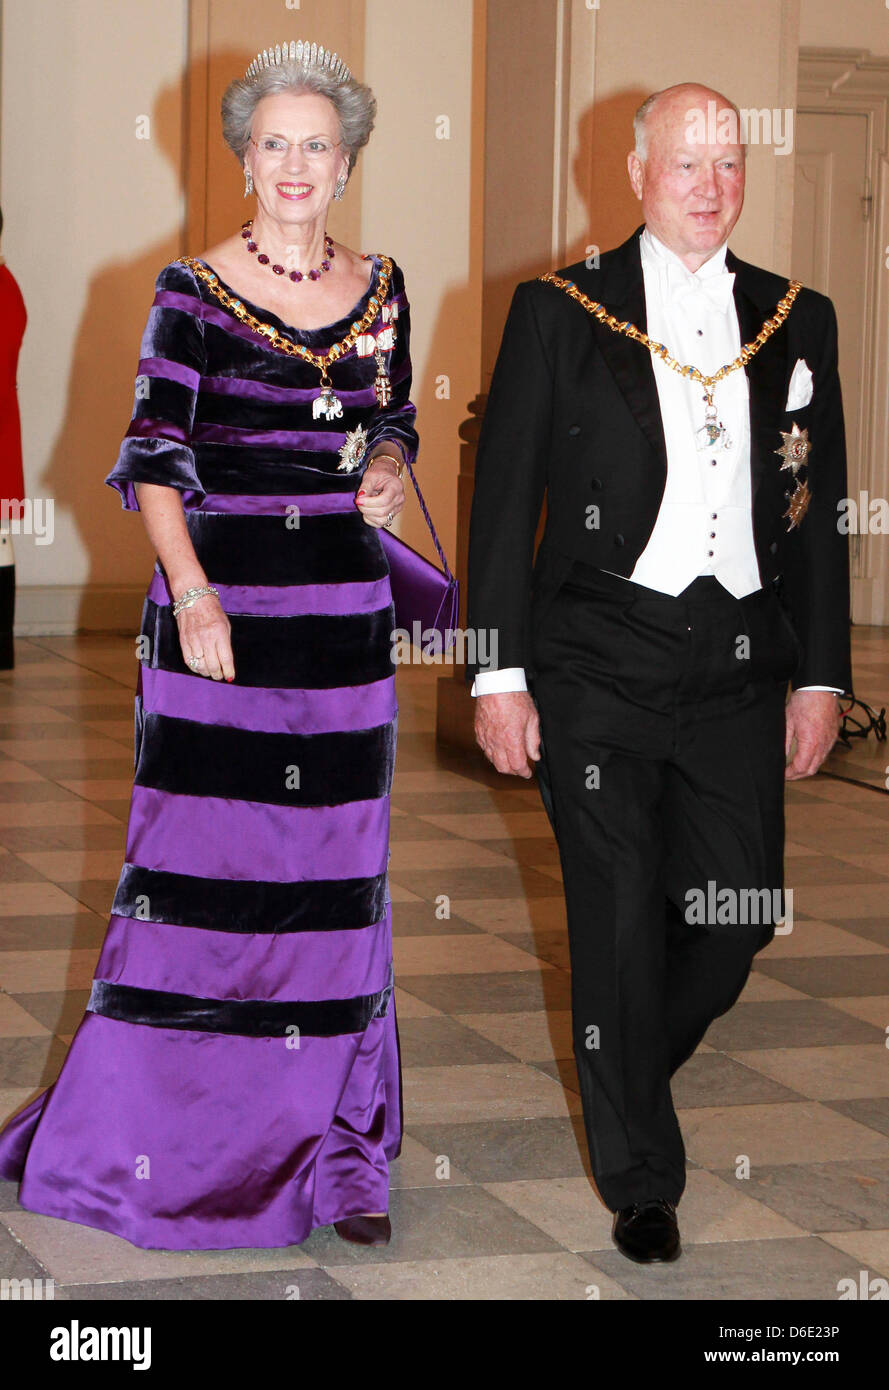 Princess Benedikte of Denmark - Wikipedia